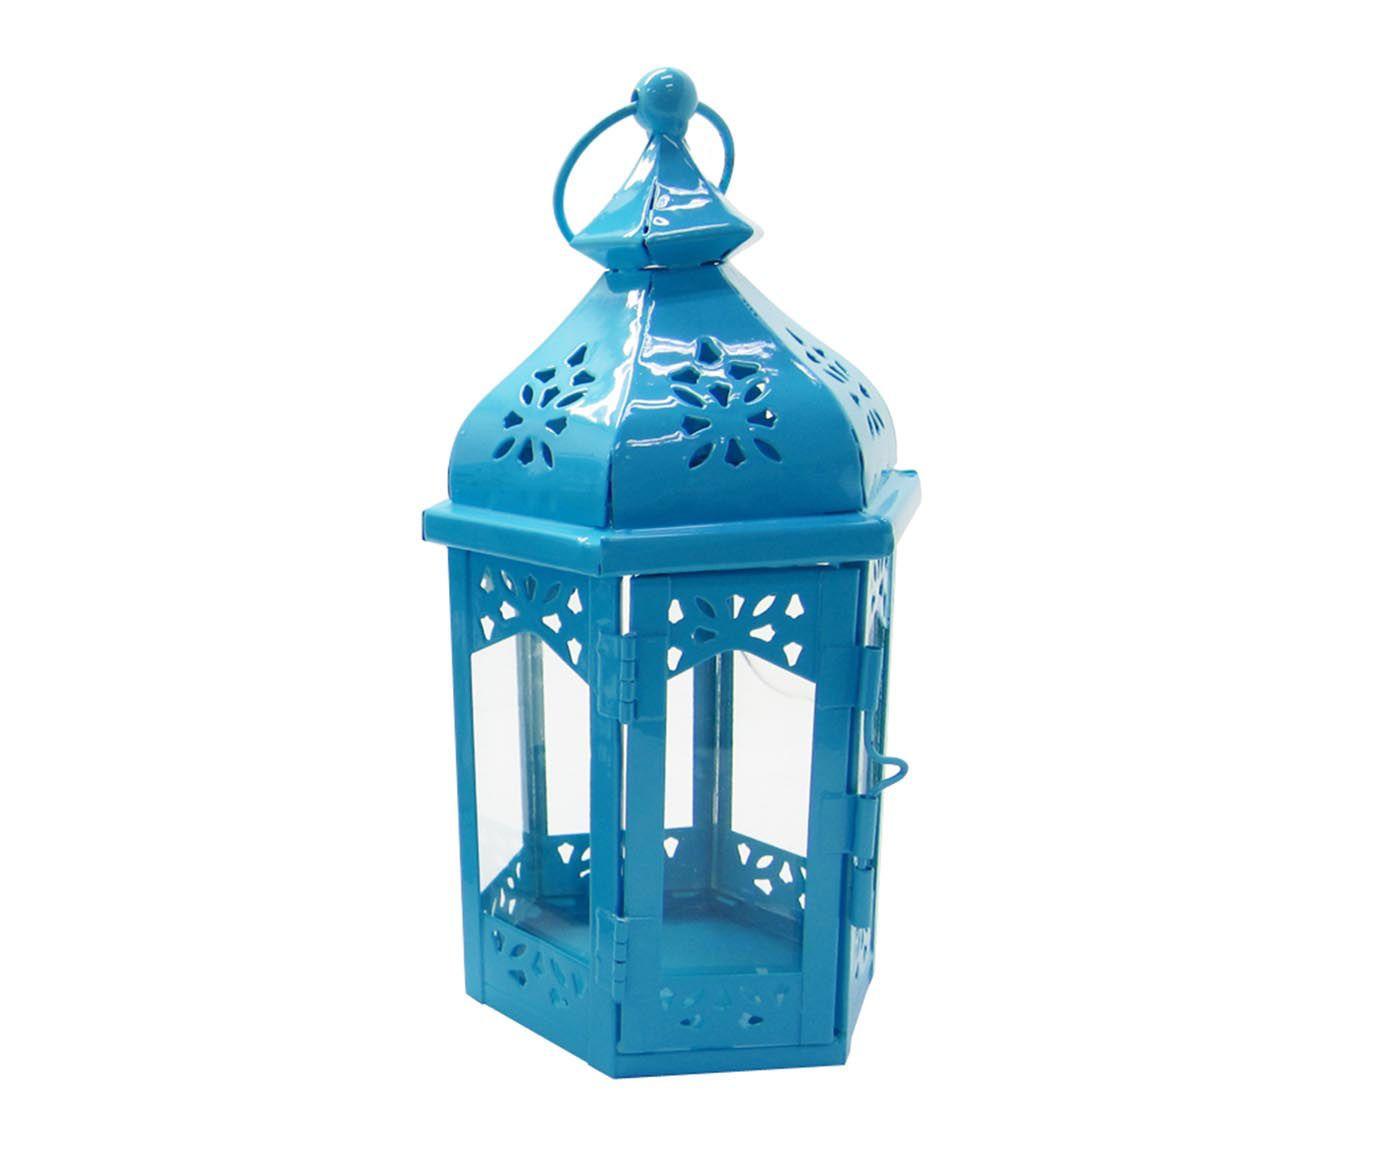 Lanterna Marroquina Hexagonal Azul - 22cm | Westwing.com.br